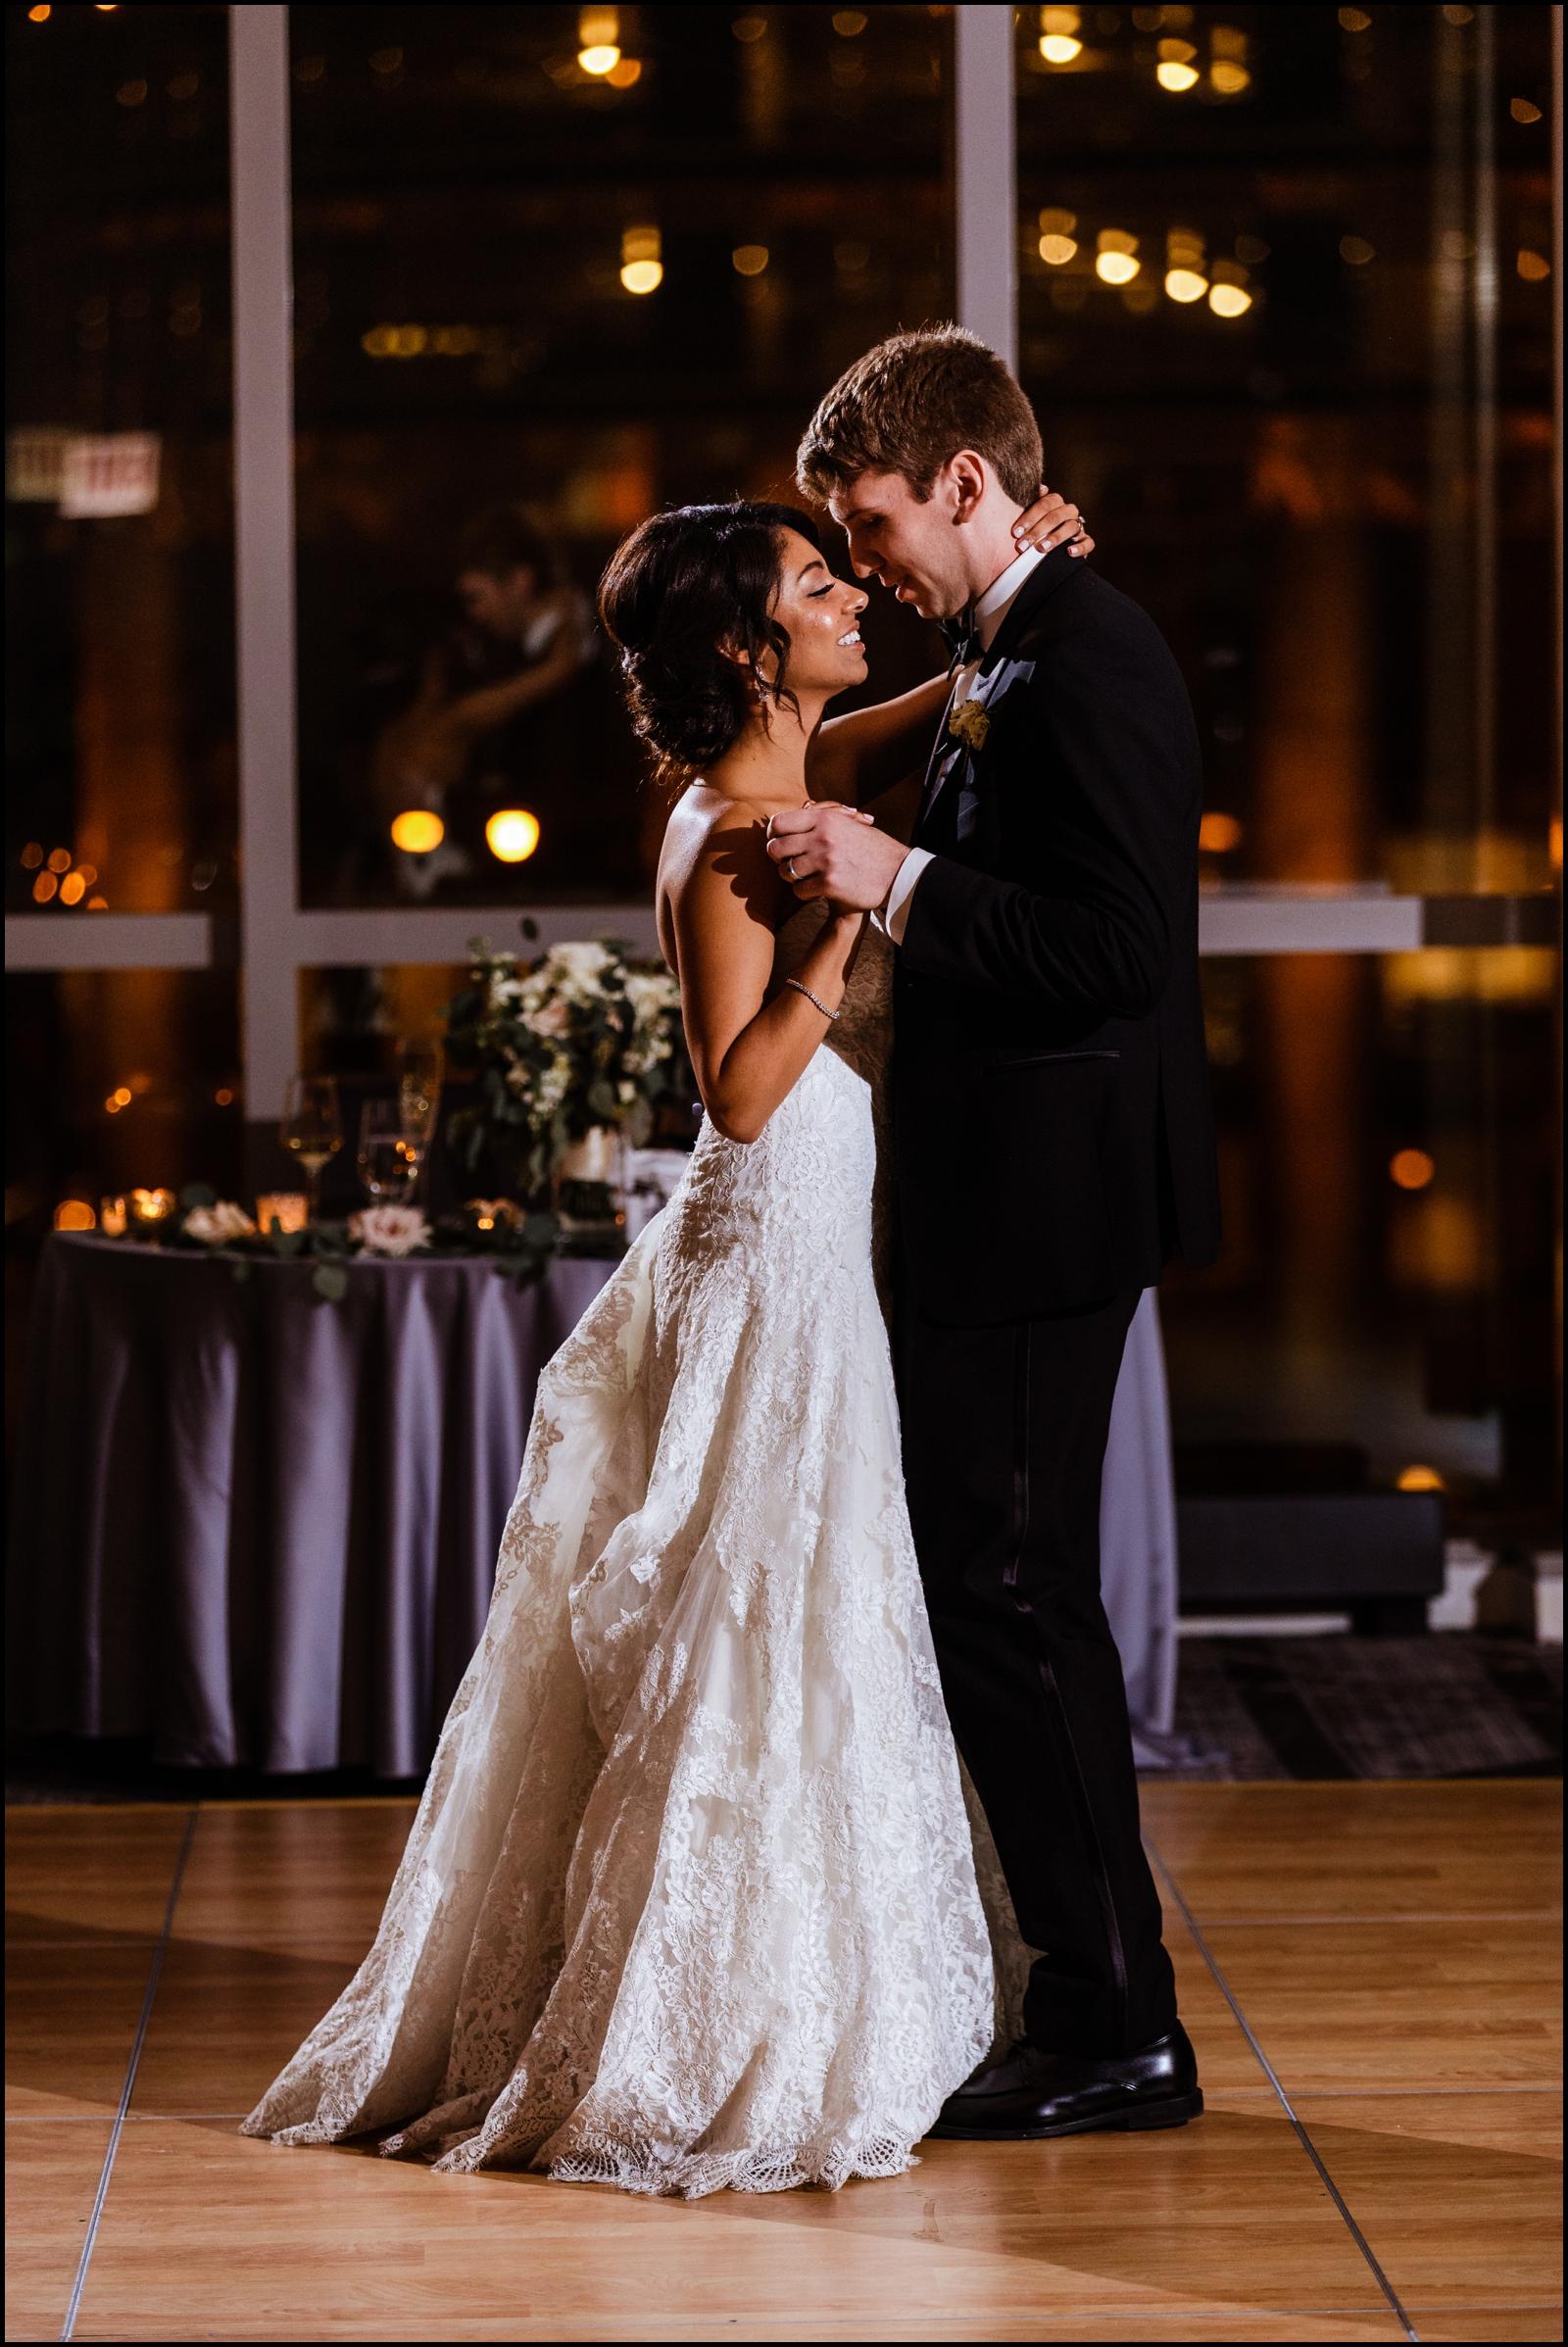 Chicago Wedding- Alice Millar Chapel Ceremony, London House Reception_0124.jpg